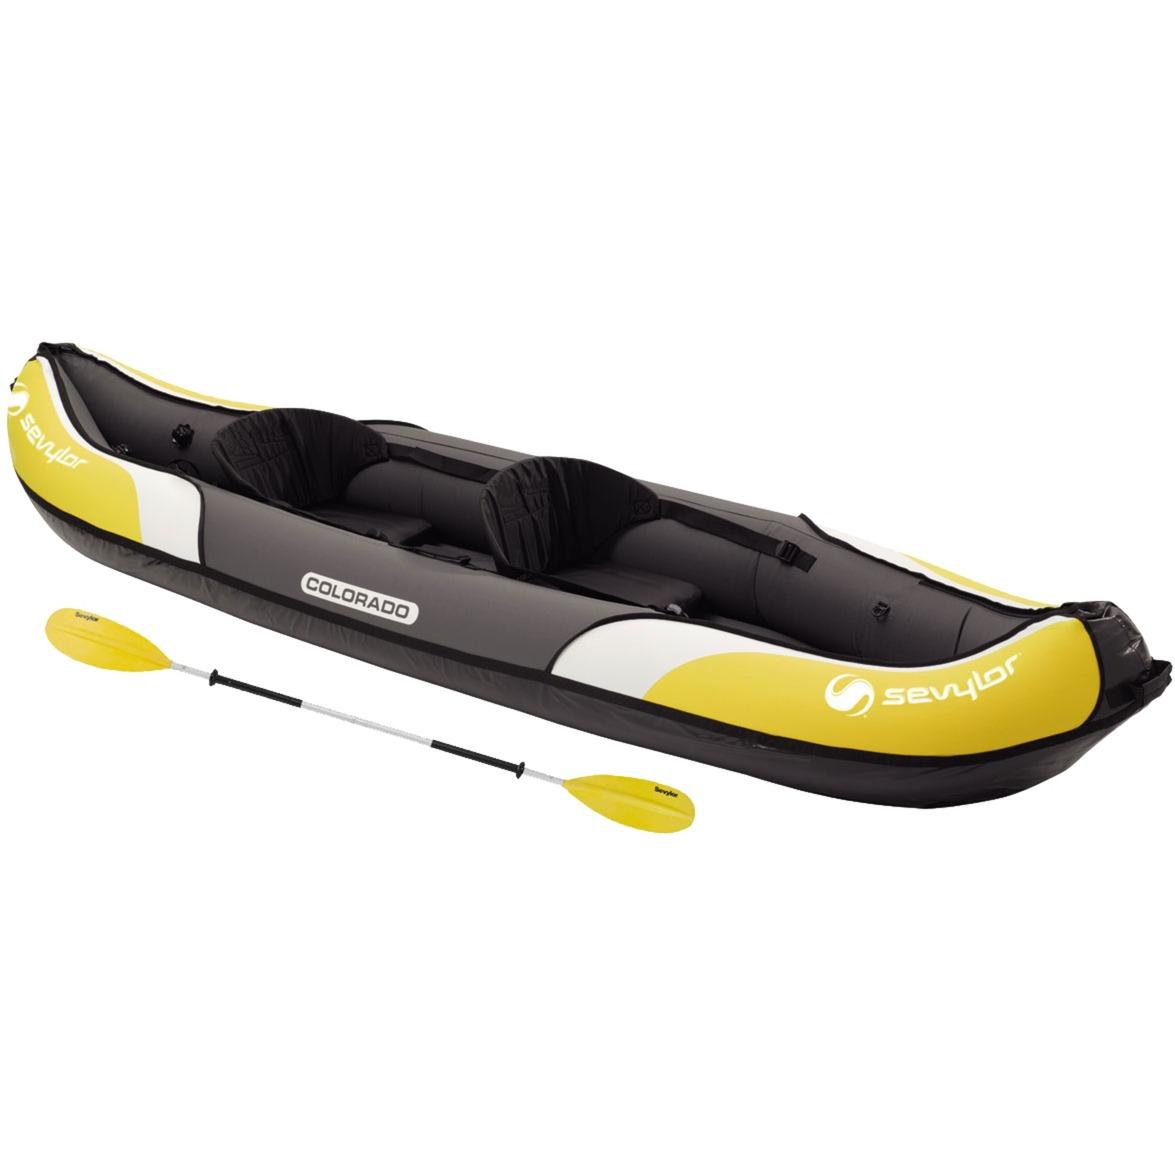 2000016743 kayak deportivo 2 personas(s) Negro, Blanco, Amarillo, Barco inflable